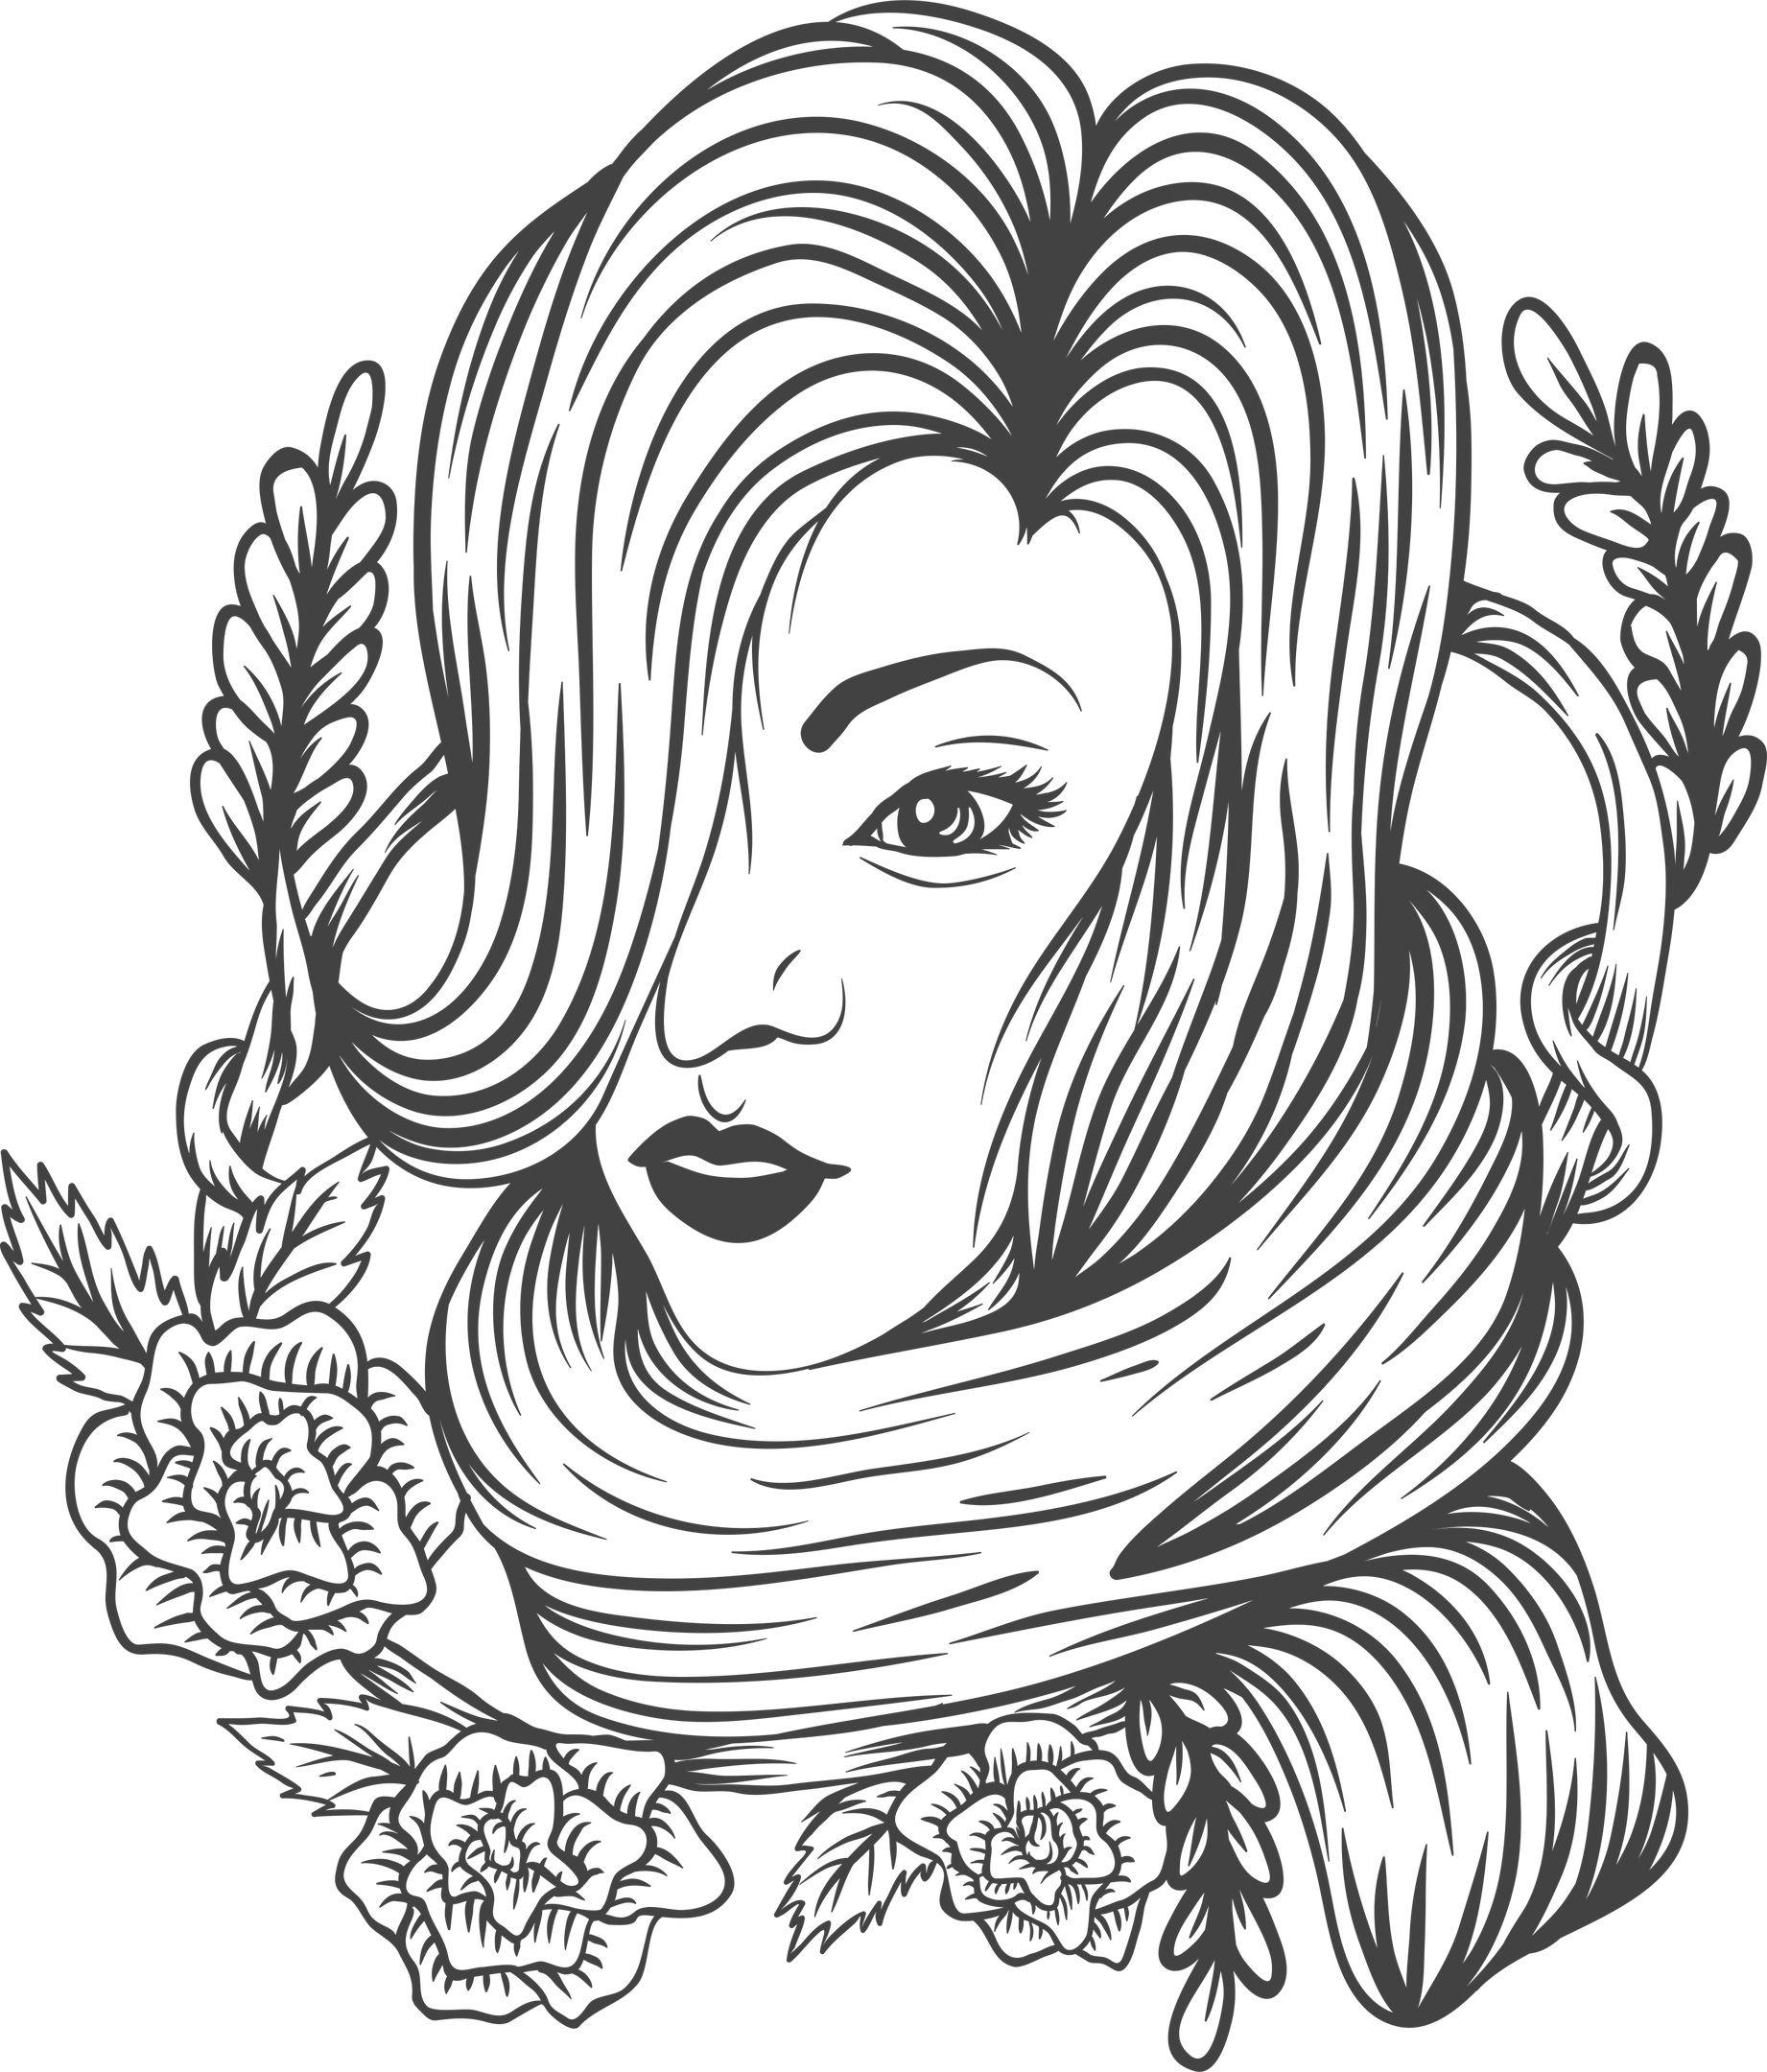 Woman Flower Decor Free Vector cdr Download Flower